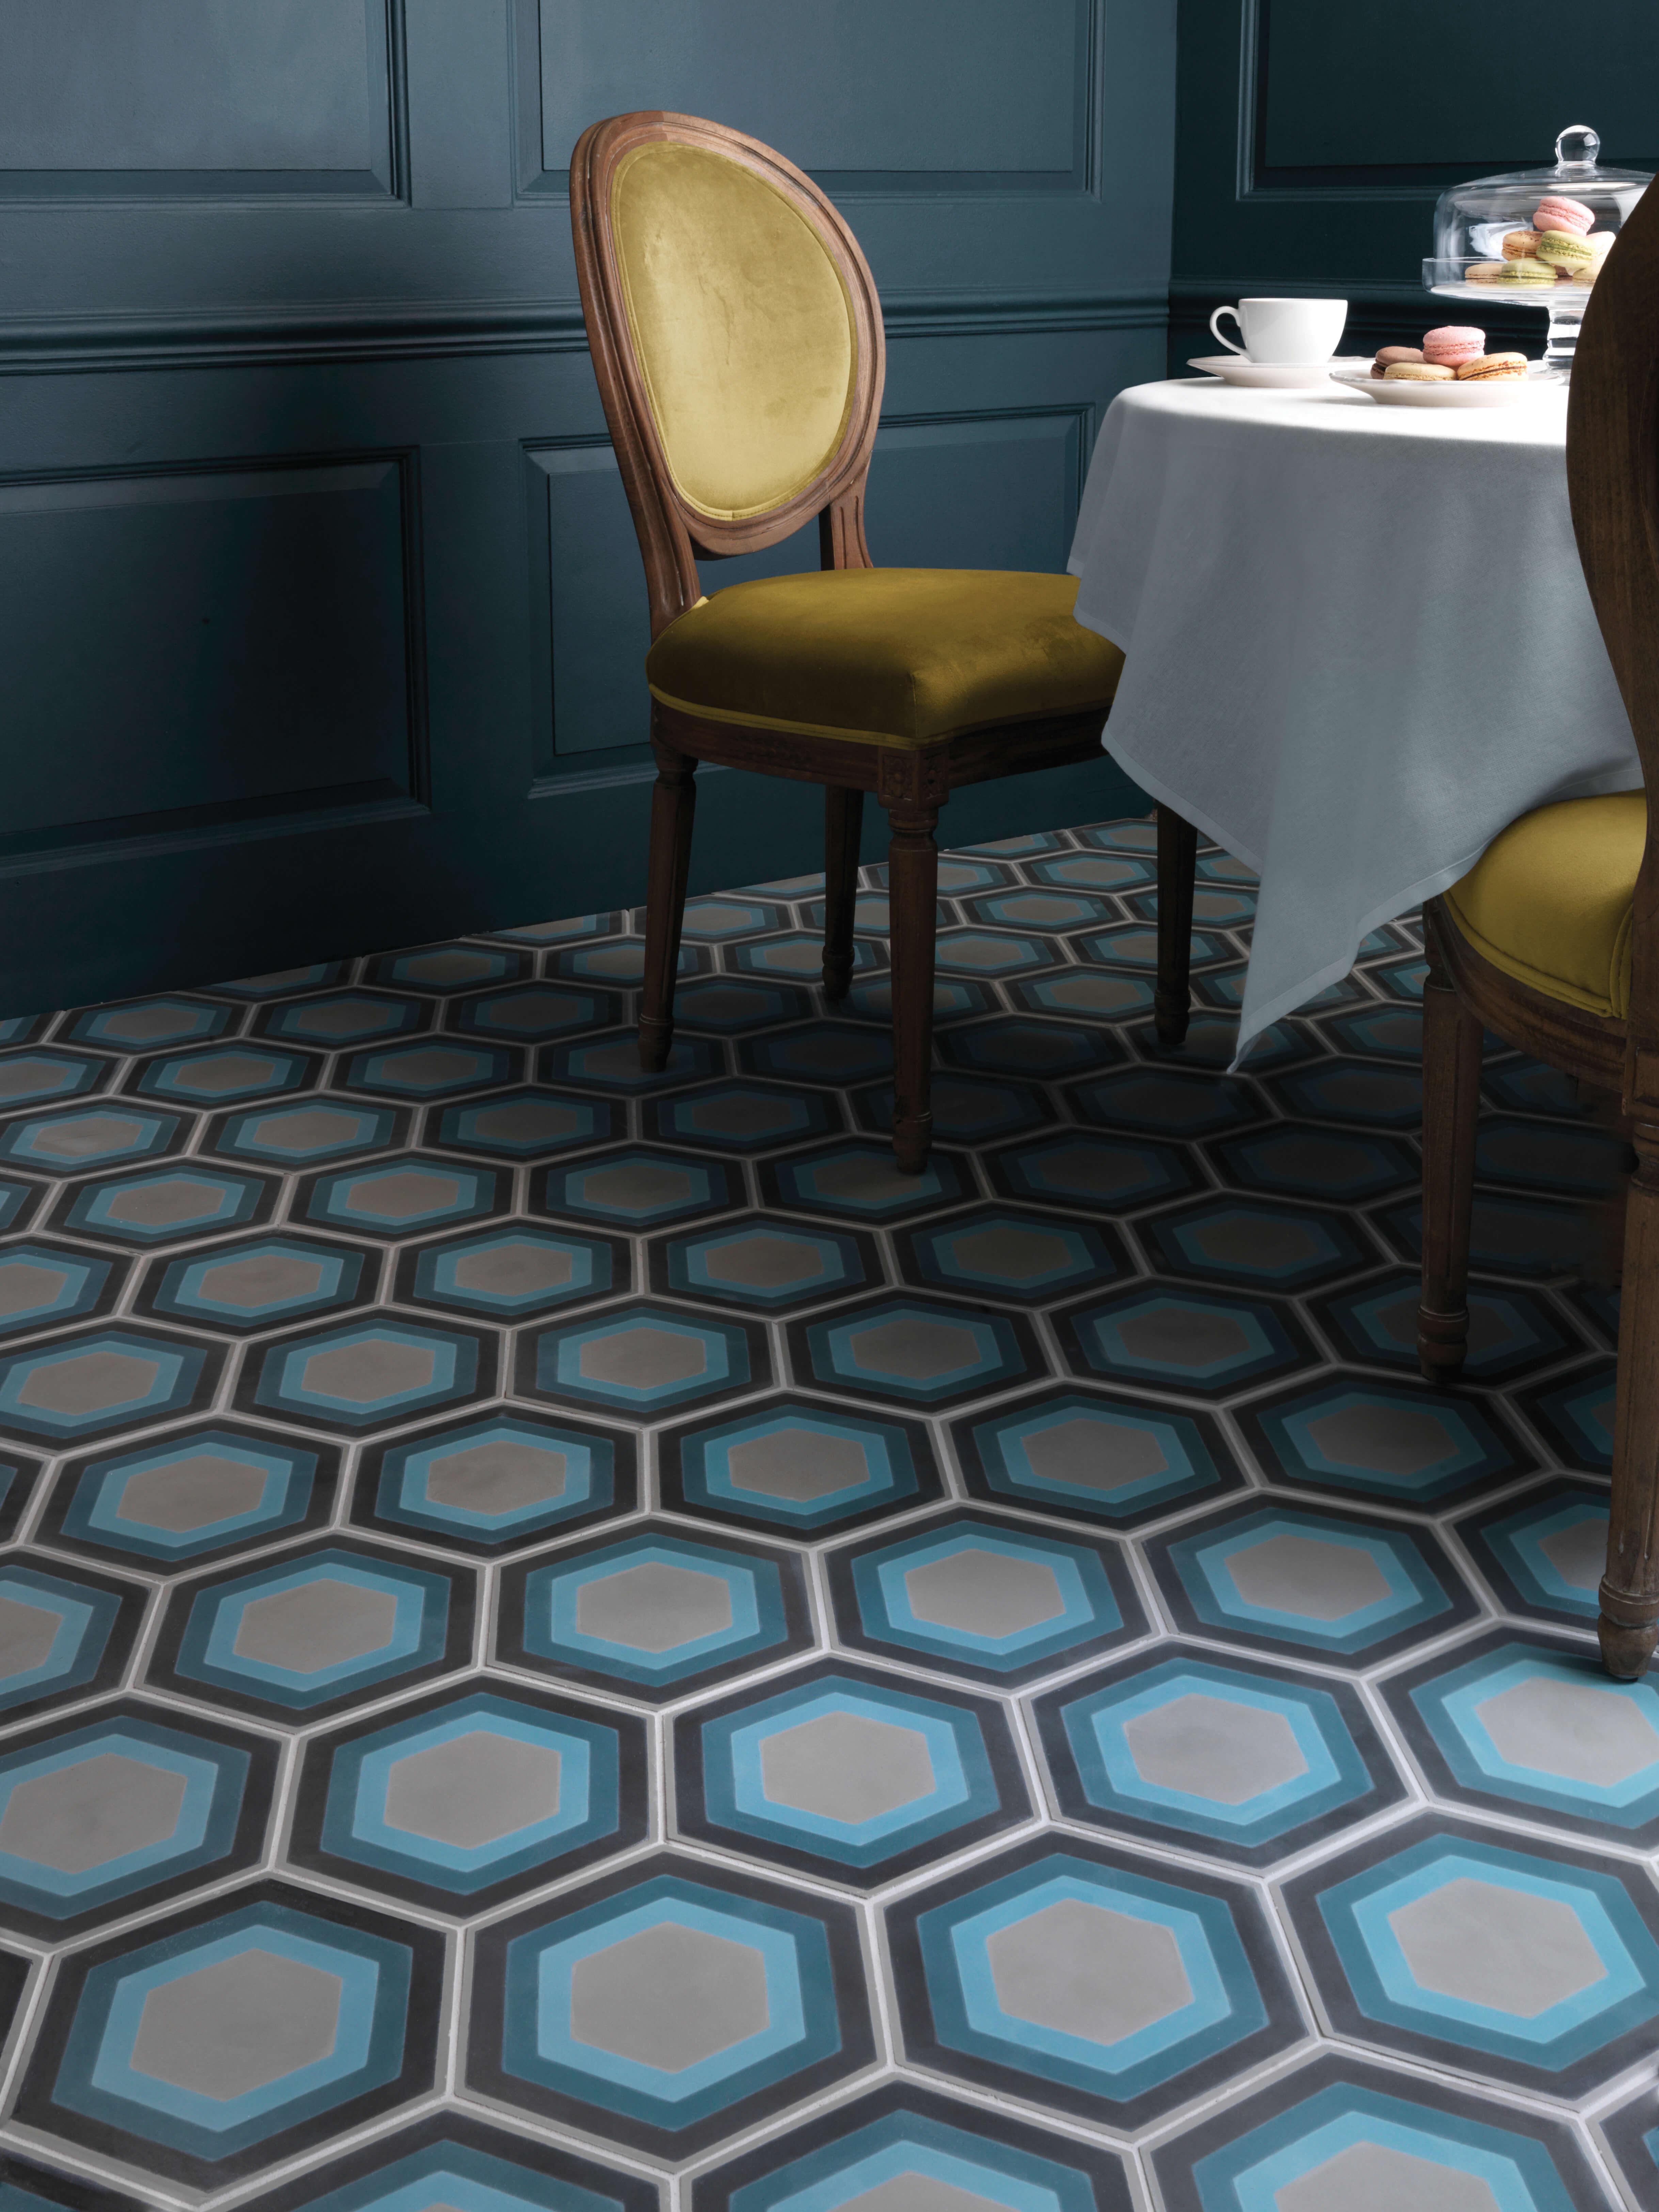 patisserie pattern tile tiles ca 39 pietra. Black Bedroom Furniture Sets. Home Design Ideas